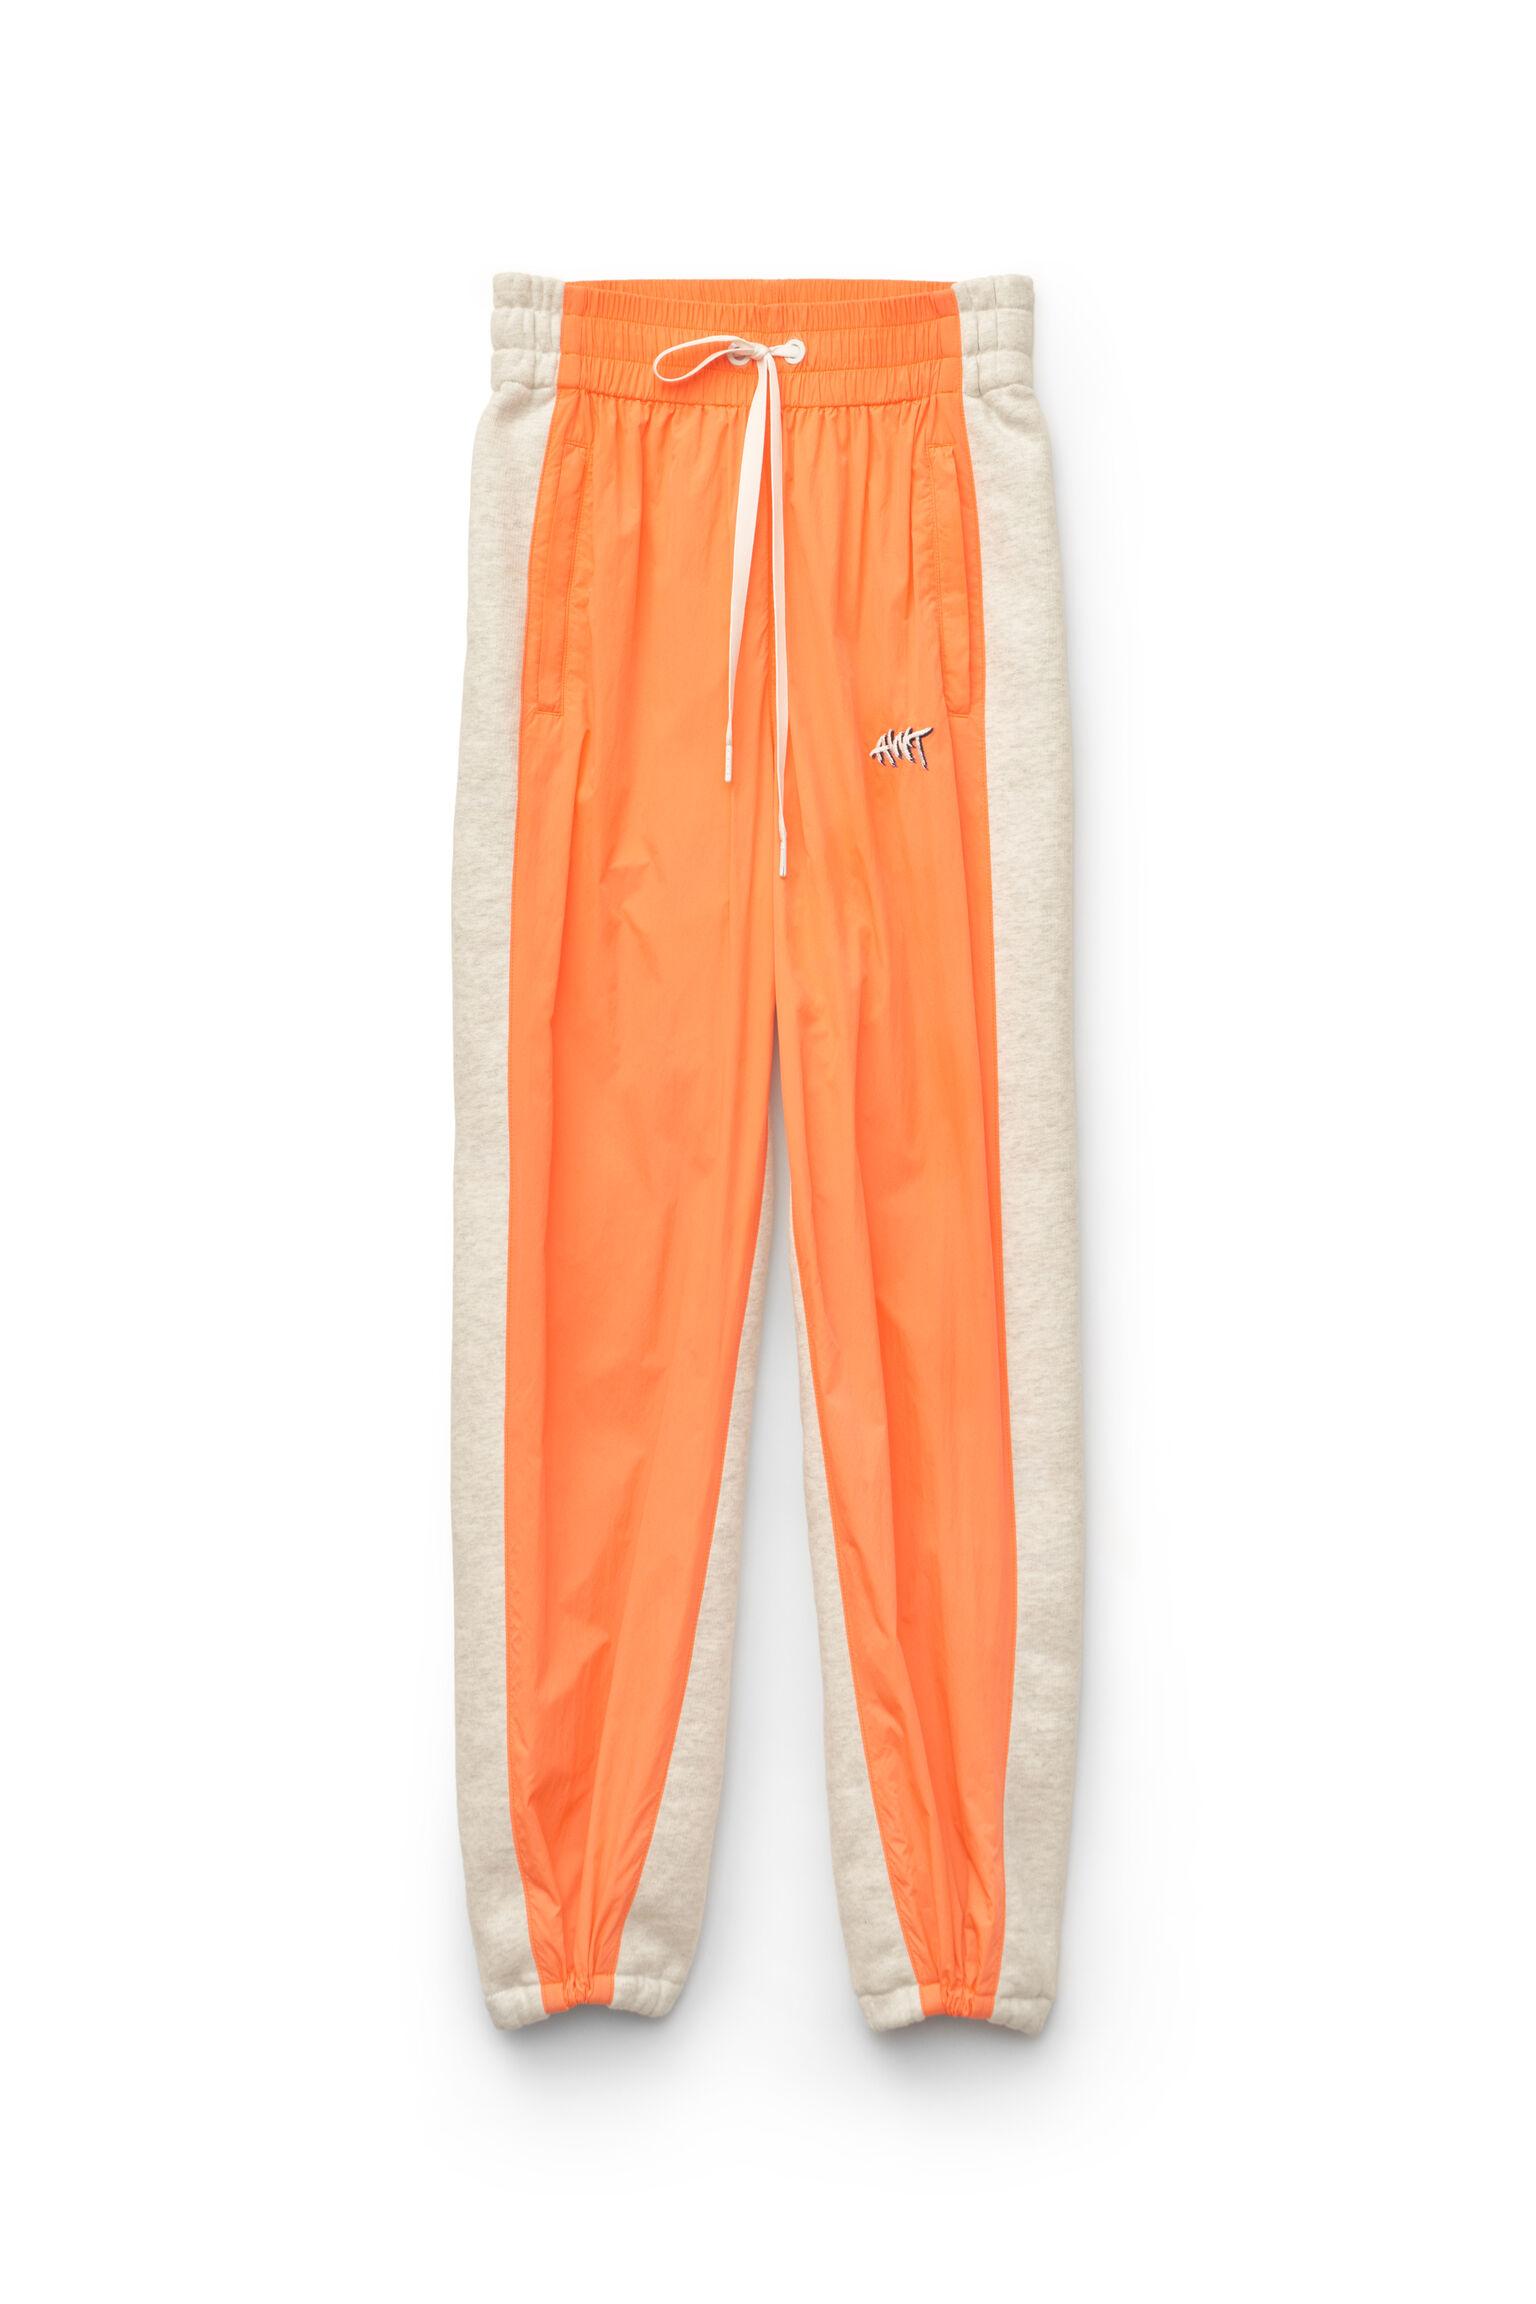 c488f0c4997 alexanderwang washed nylon pants - Alexander Wang